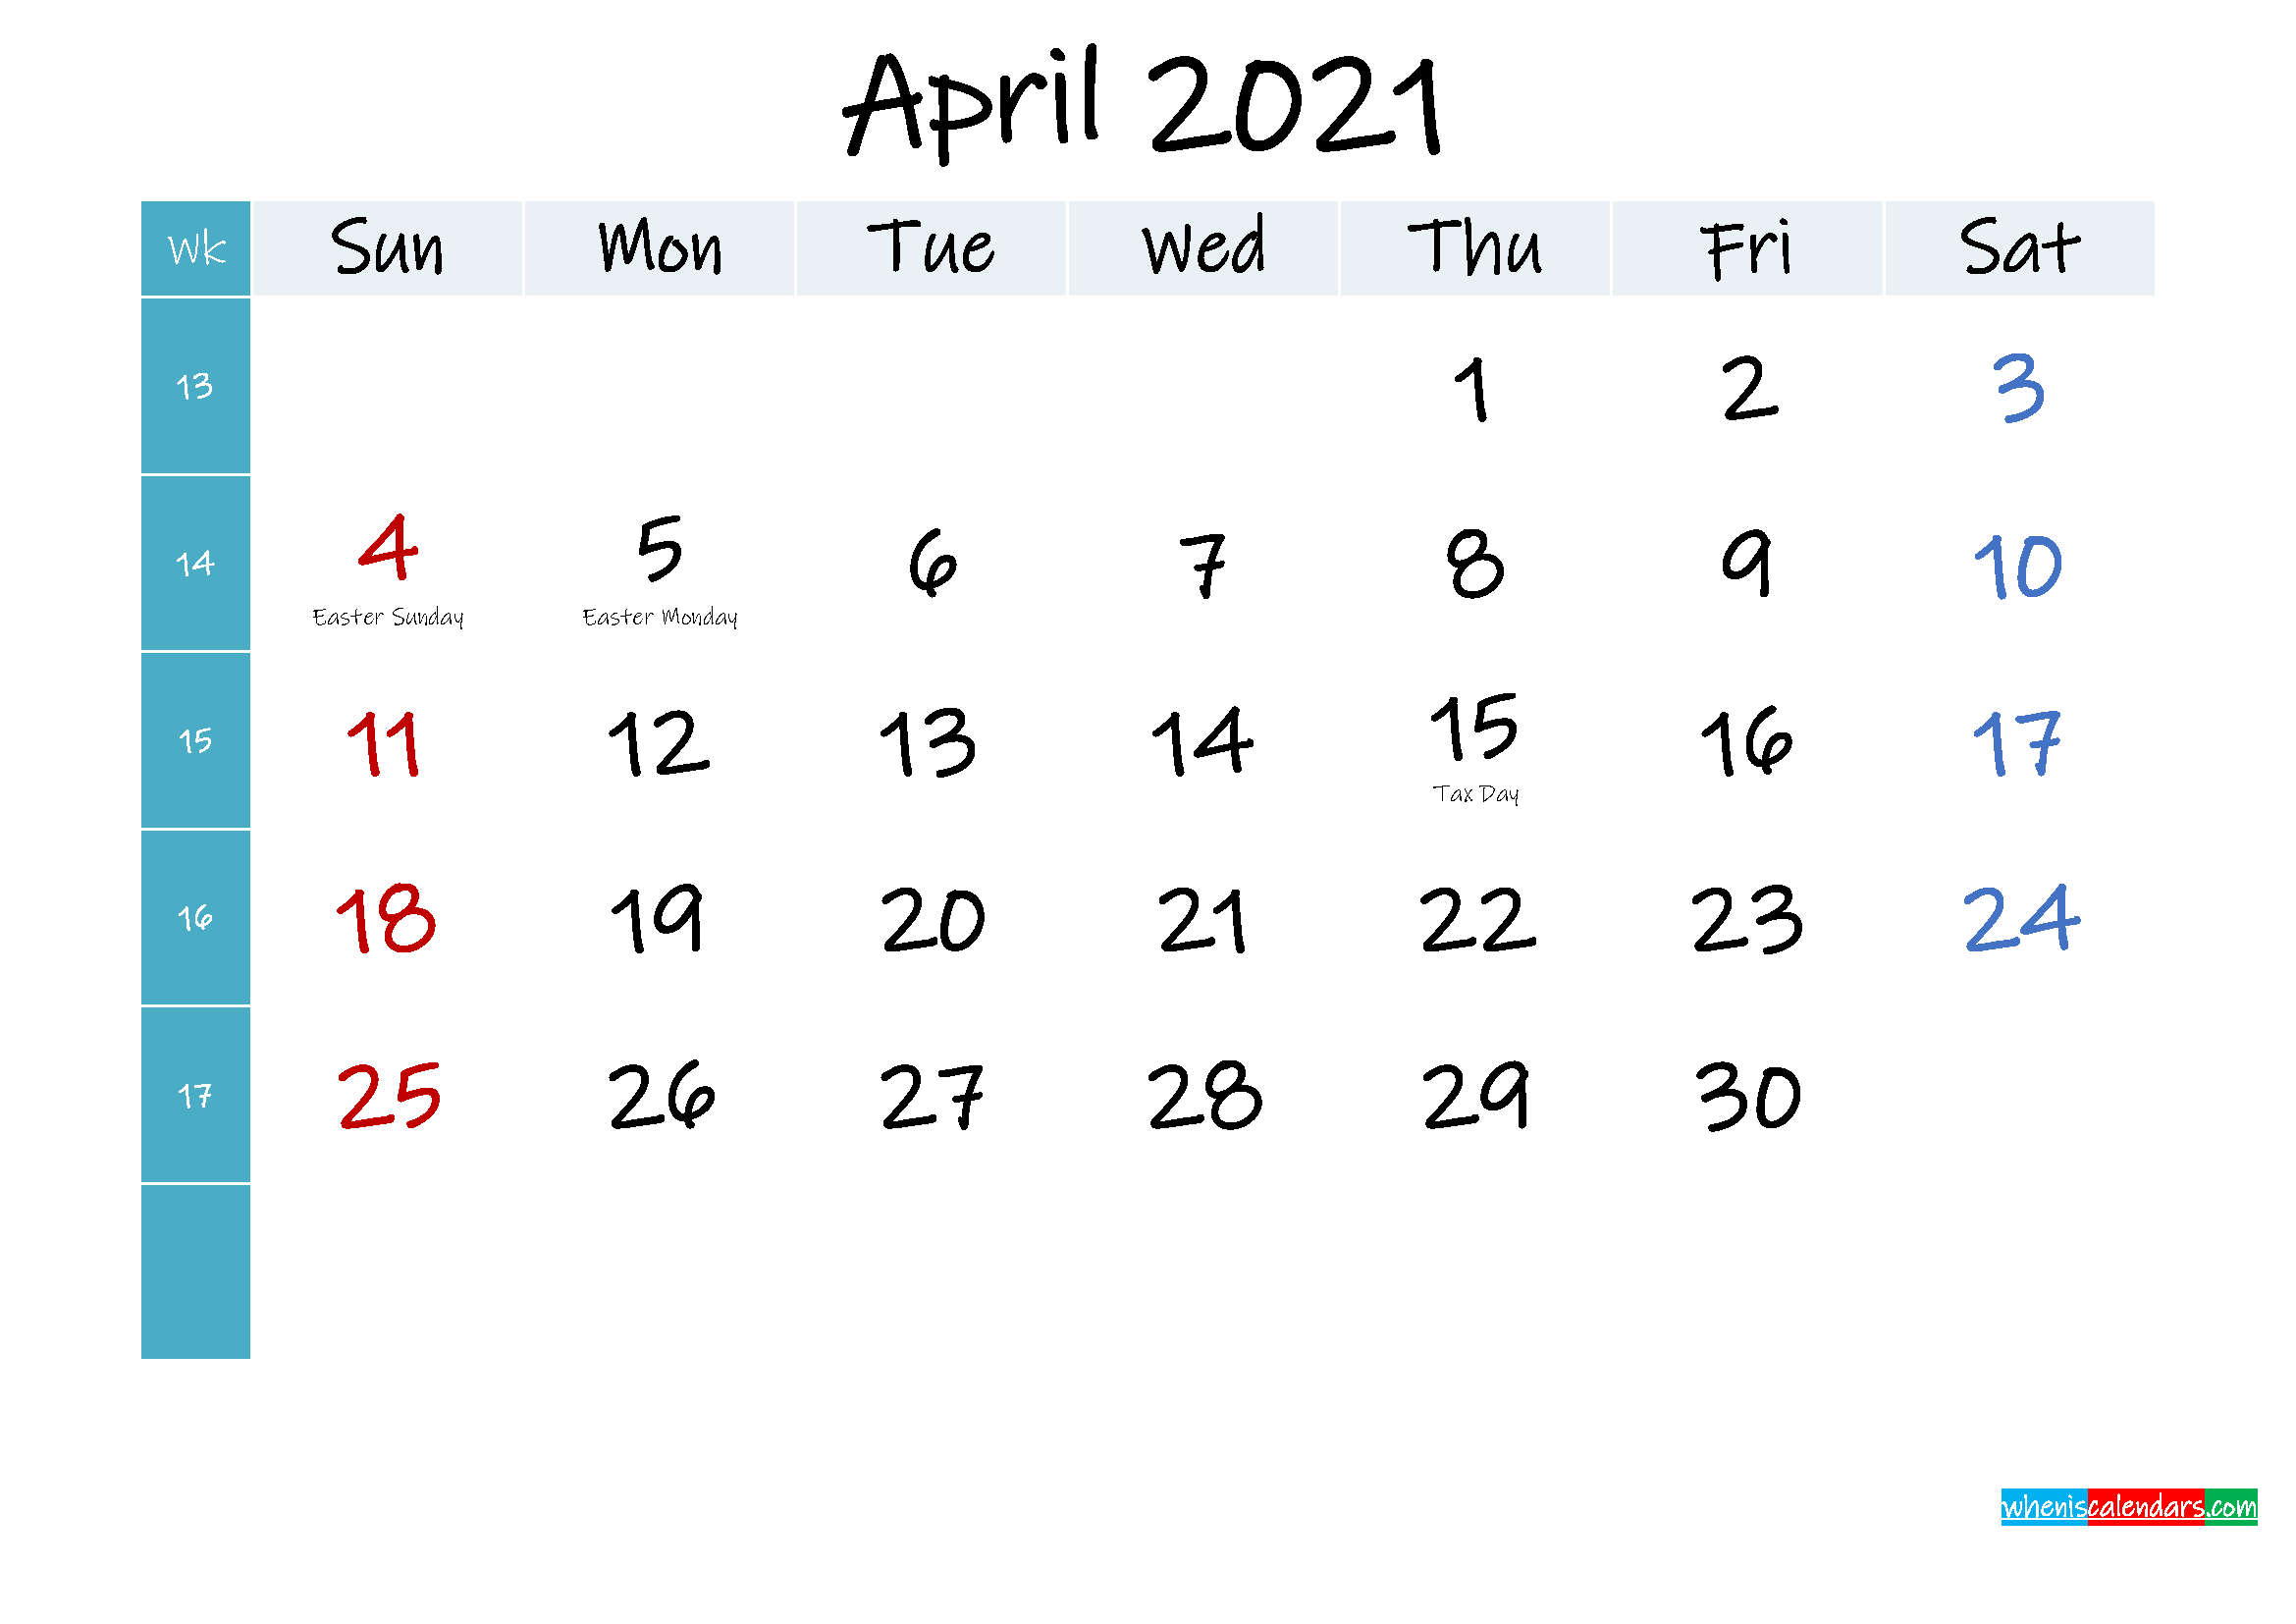 April 2021 Free Printable Calendar - Template No.ink21m400